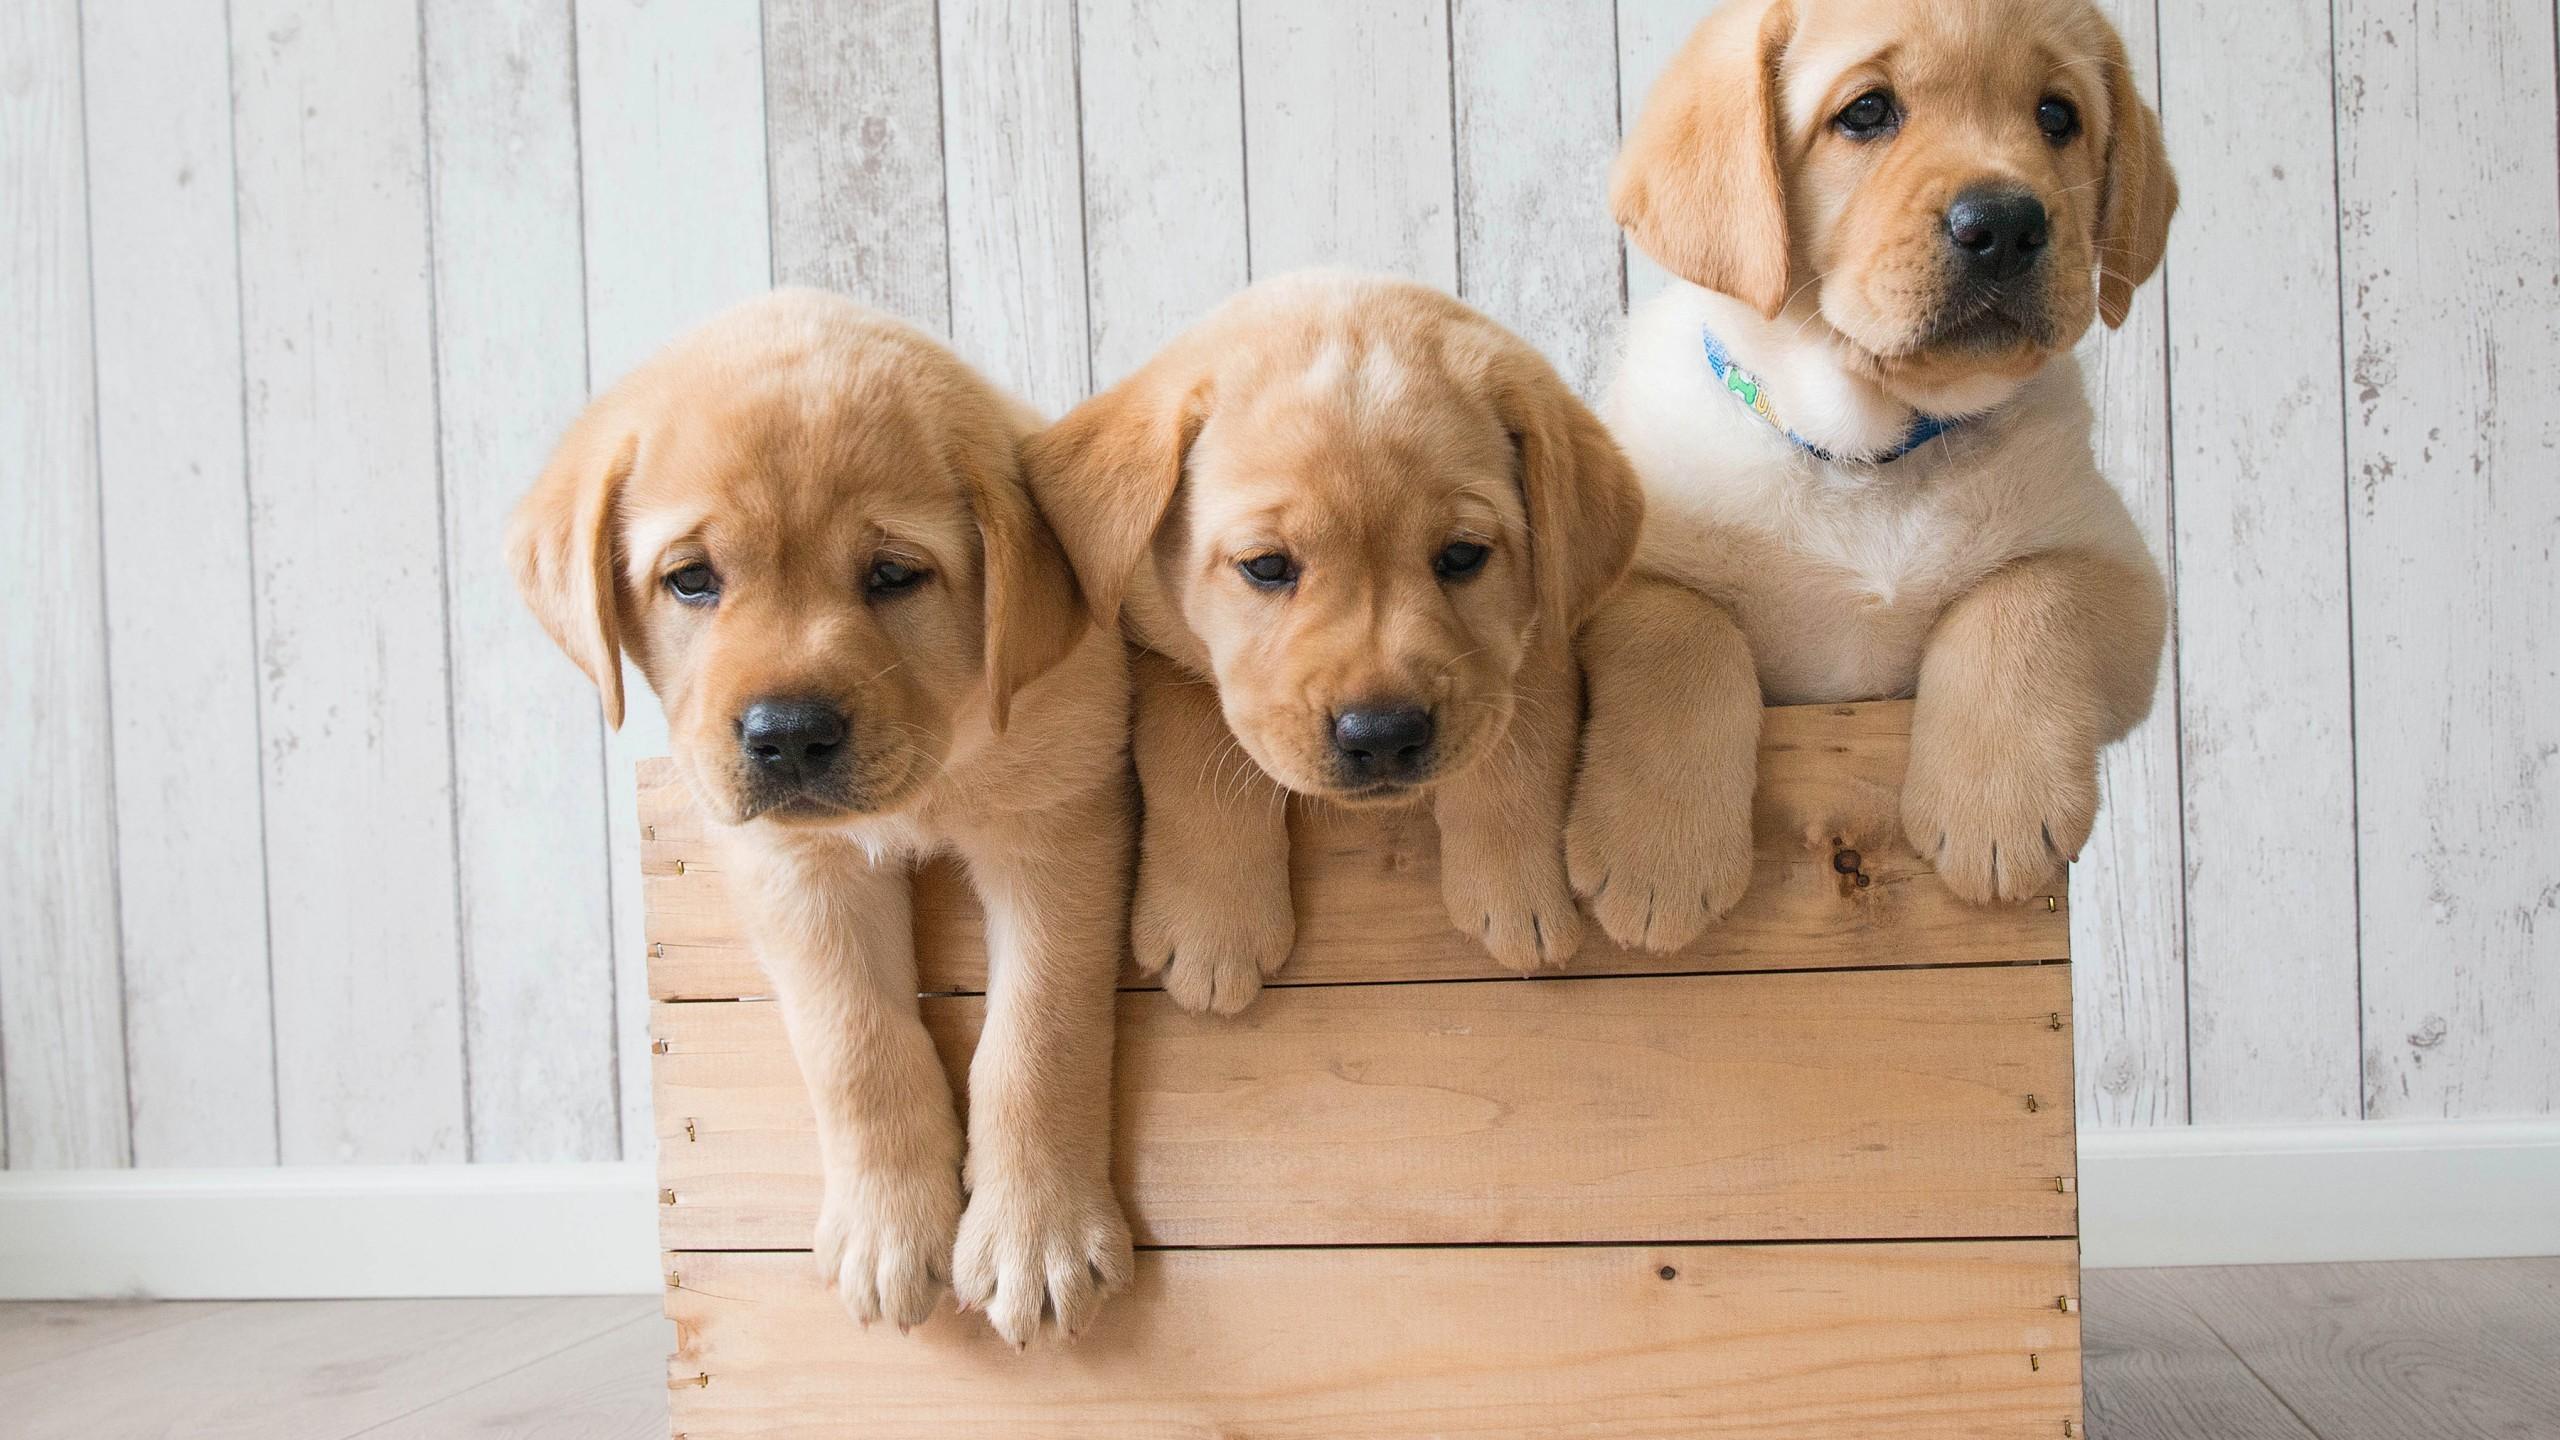 Animals / Cute puppies Wallpaper